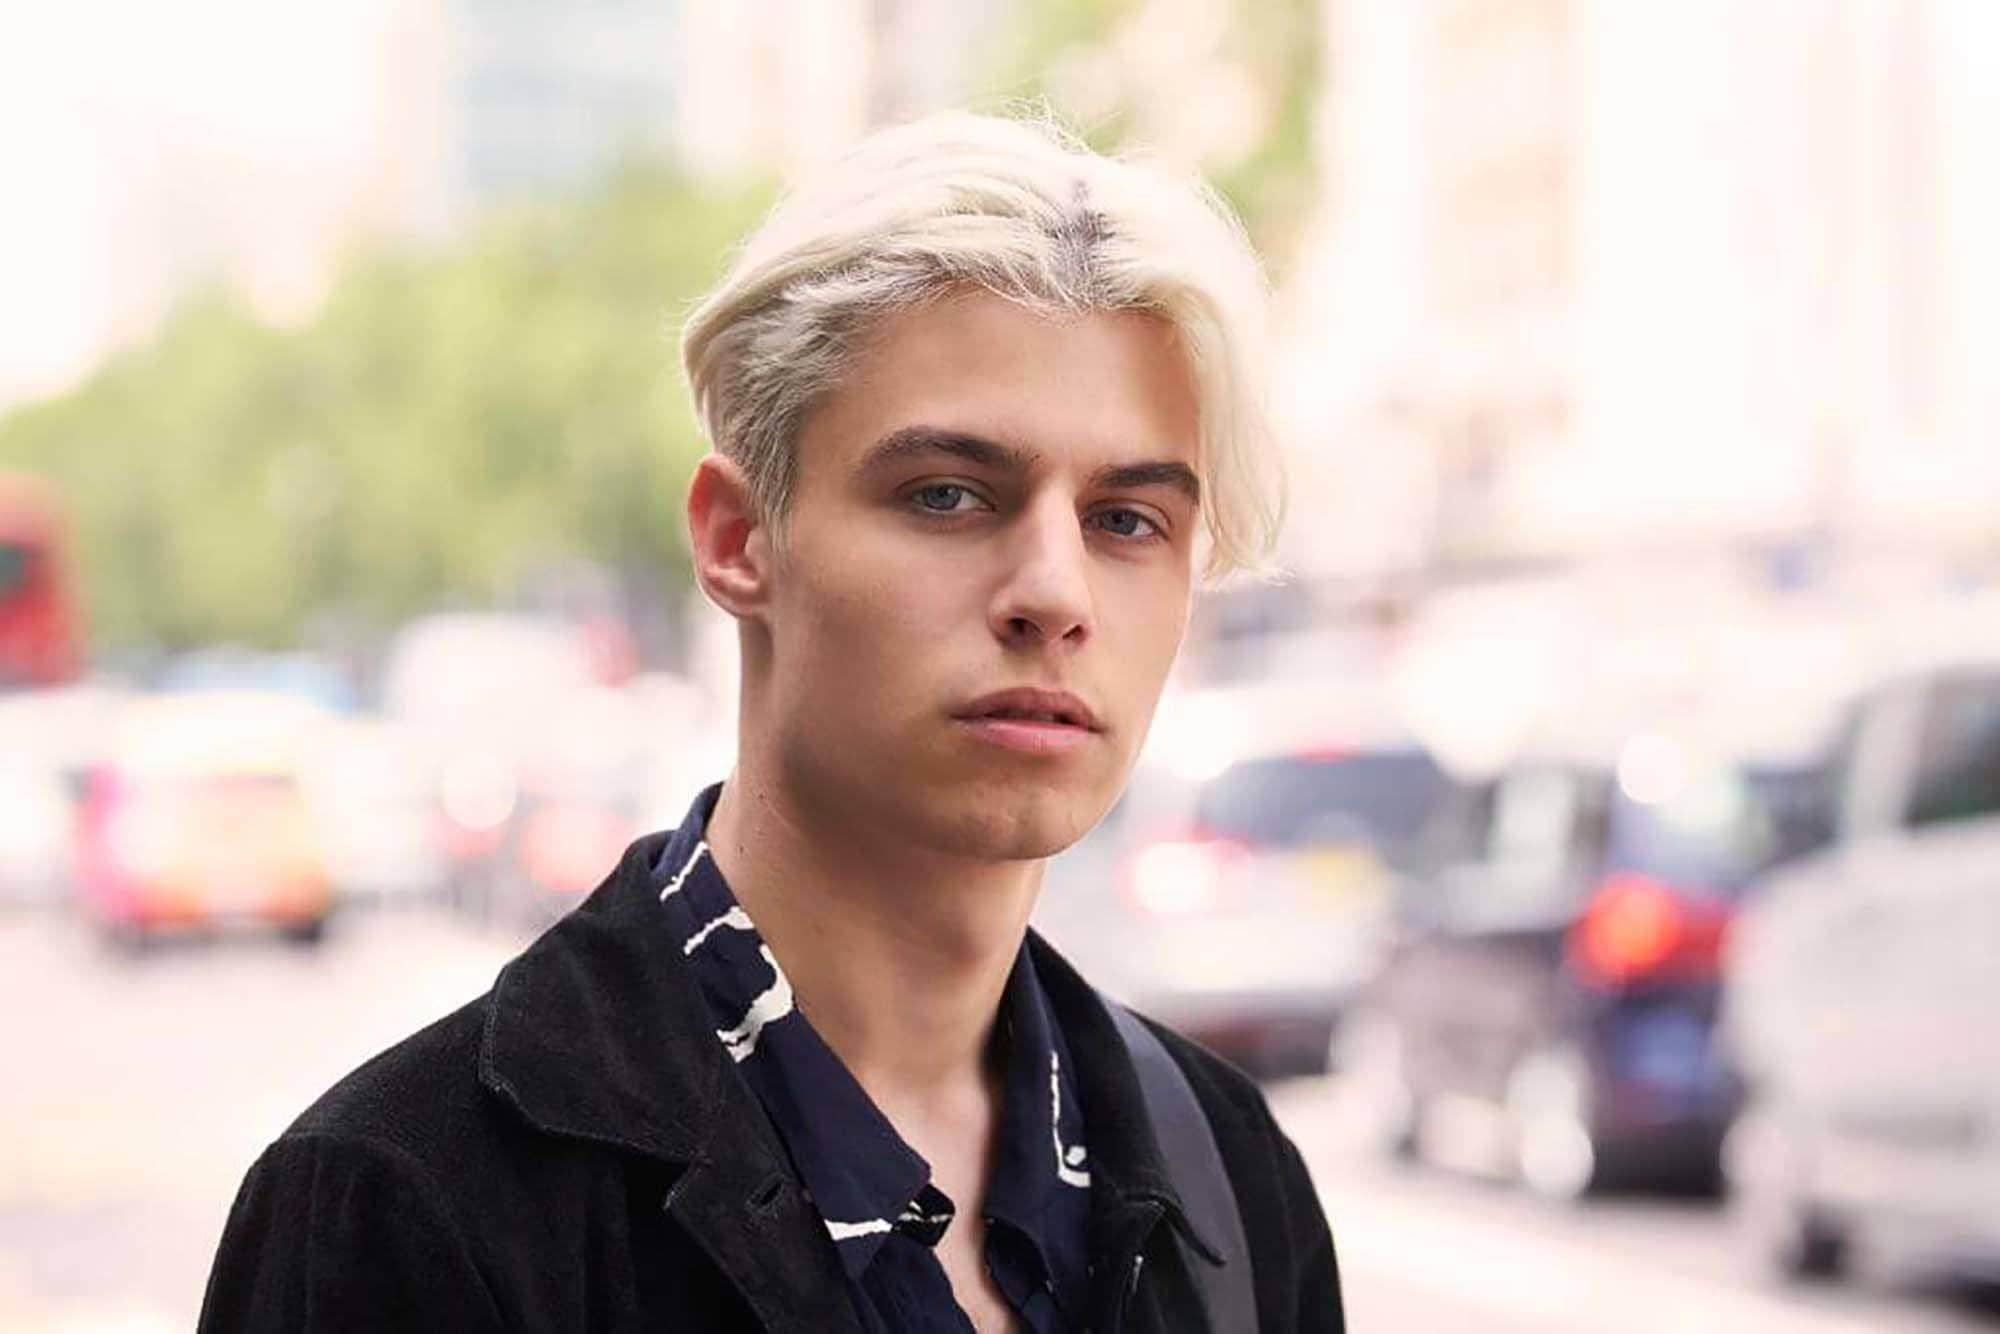 Trend warna rambut pria 2018 warna rambut bleach blonde atau ice blonde.